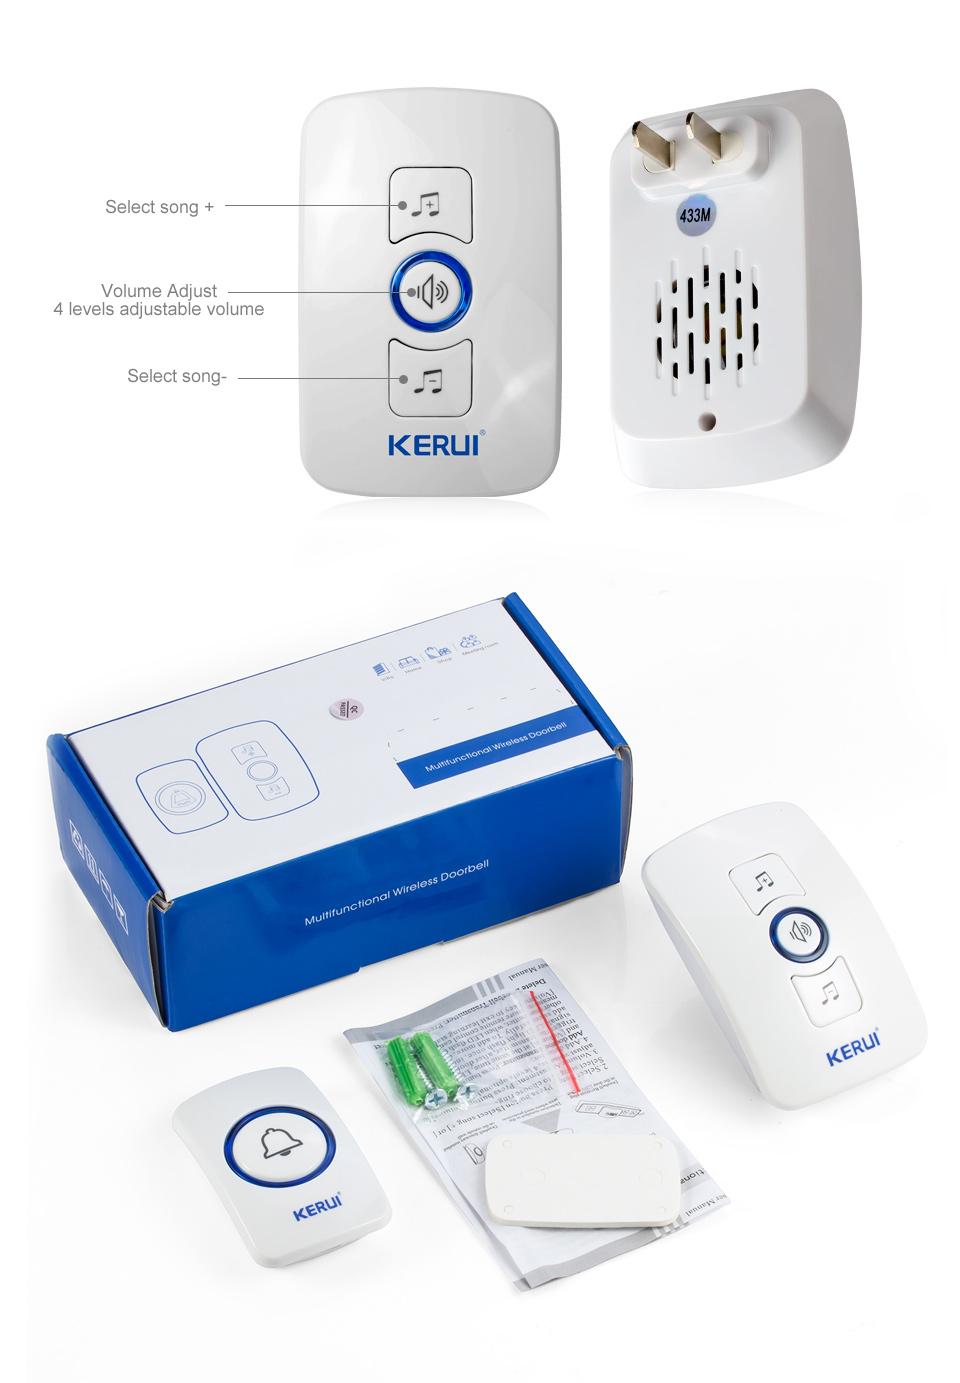 KERUI 2017 New Waterproof Multifunctional Wireless Doorbell with 32 Songs Support Multiple Doorbell Transmitter Welcome Chime_09